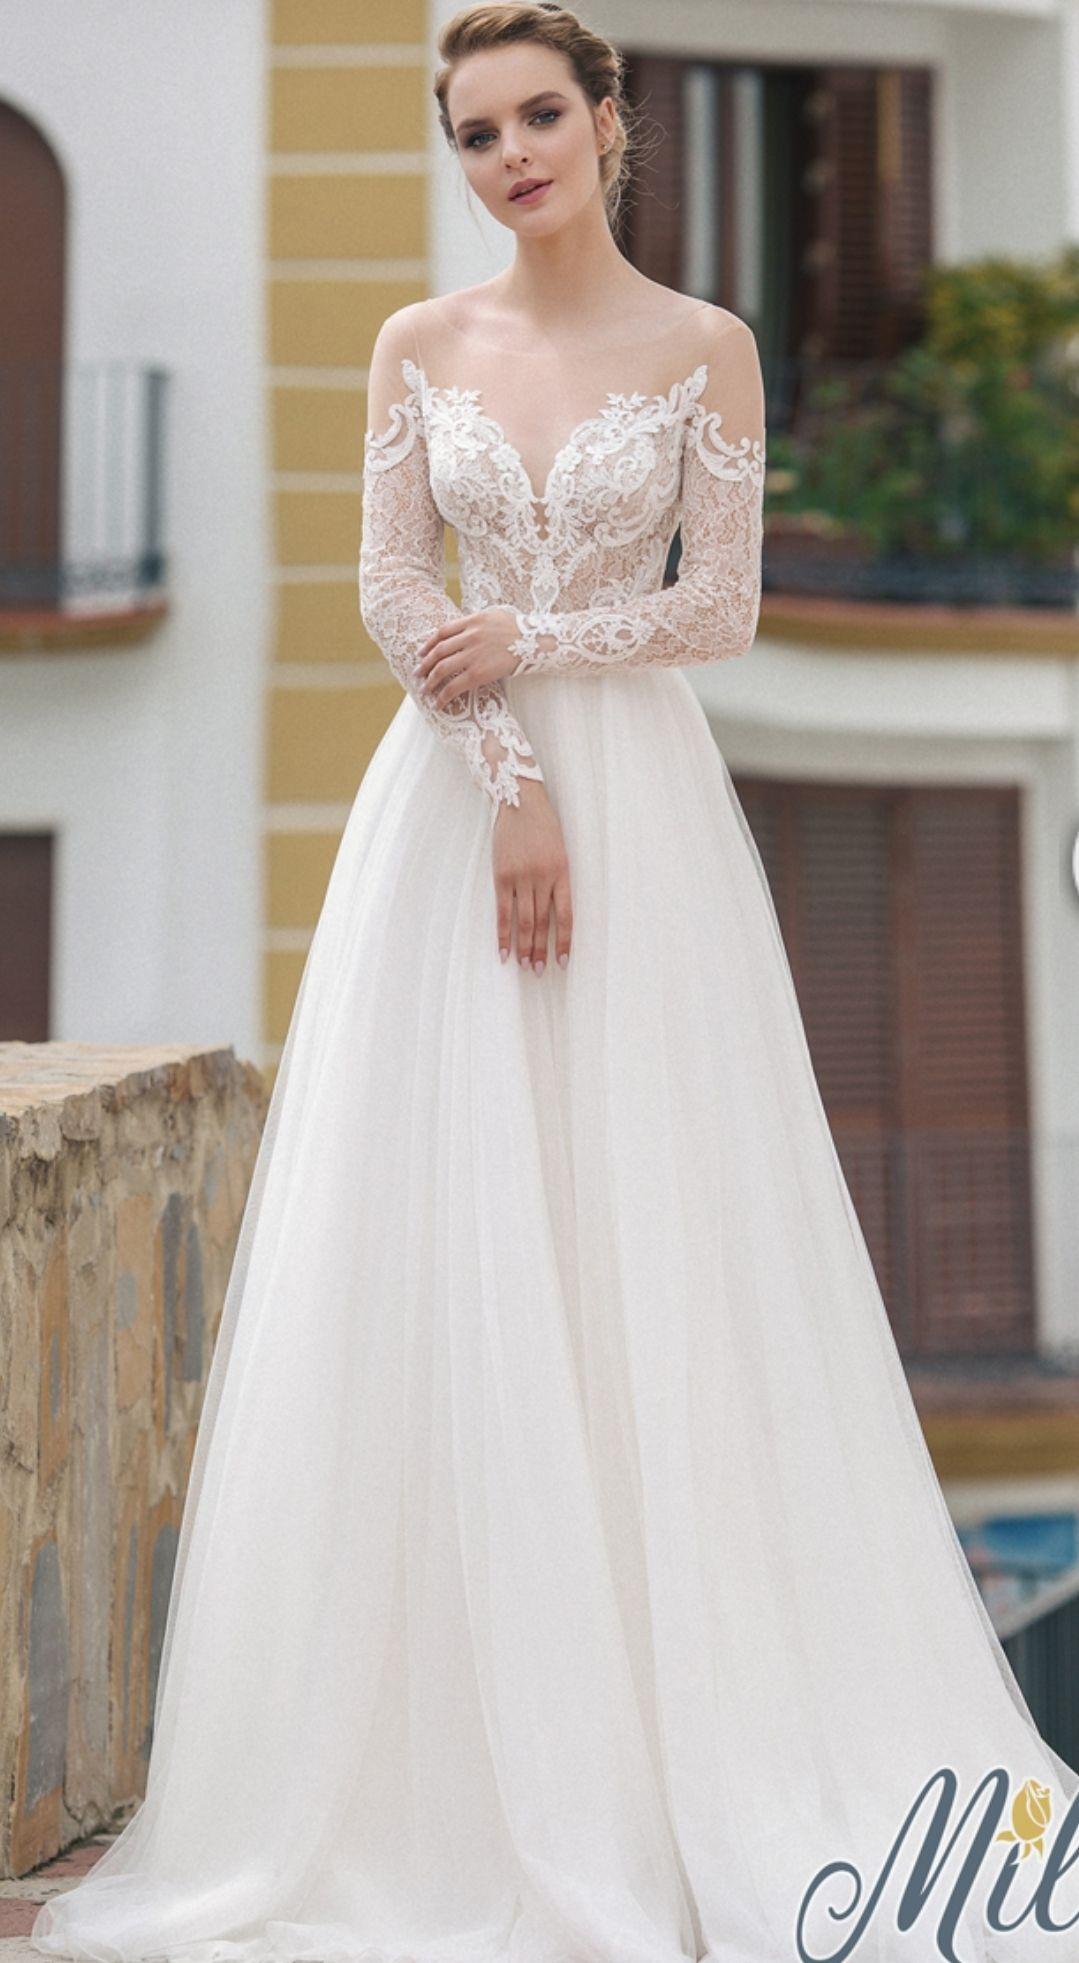 cf8cfb7132a5 Let brudekjole med lange ærmer. Www.brudekjoler-weddingdeluxe.dk ...